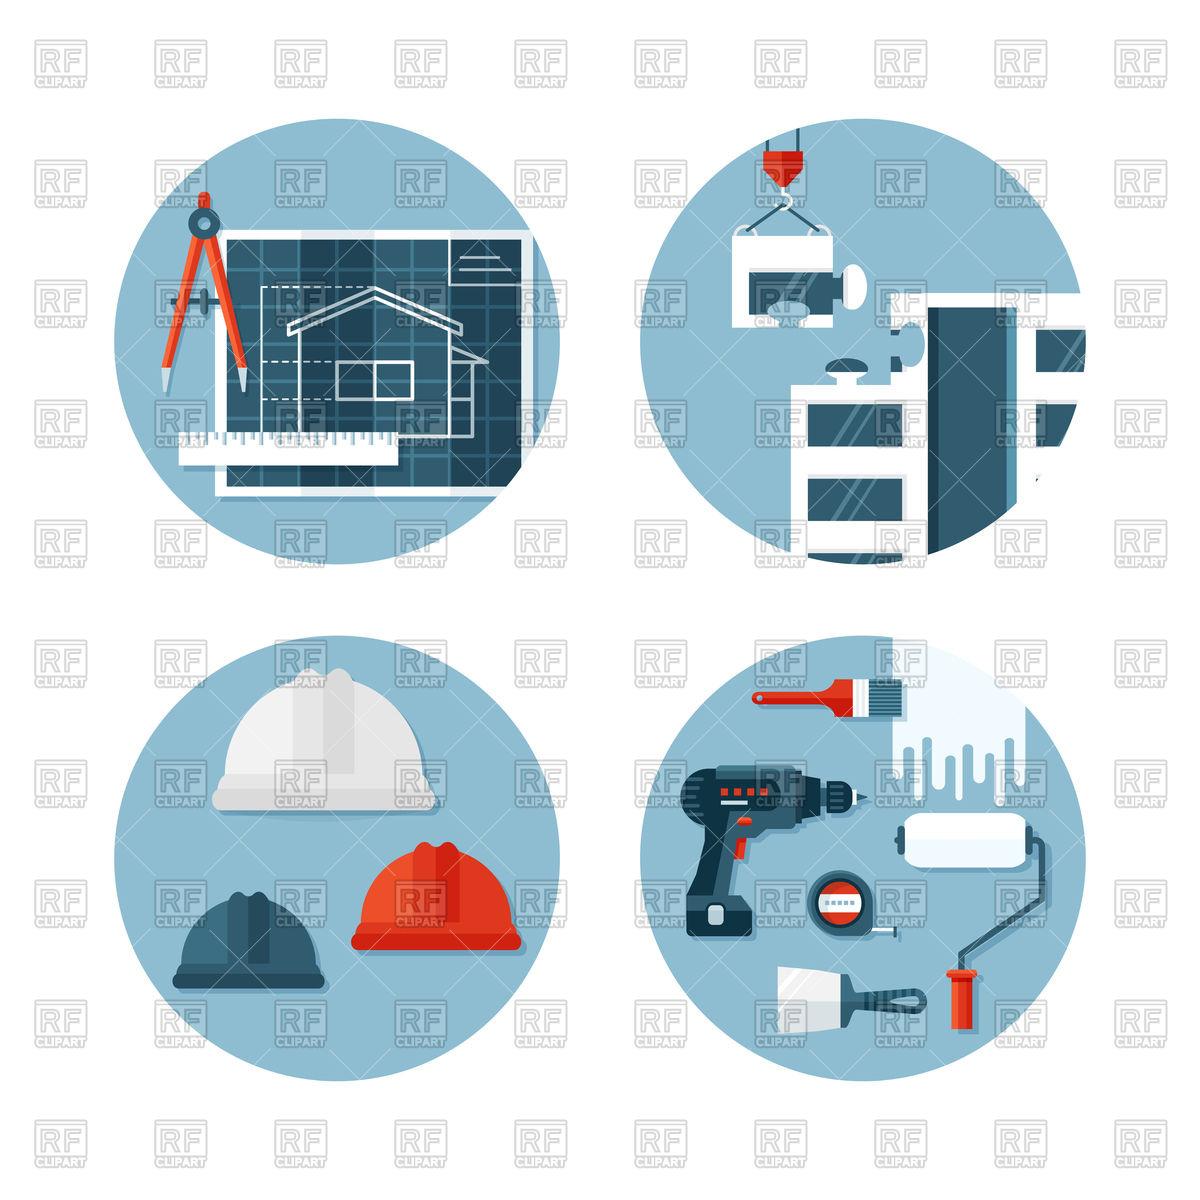 1200x1200 Tools, Ecuipment, Engineering Icons Royalty Free